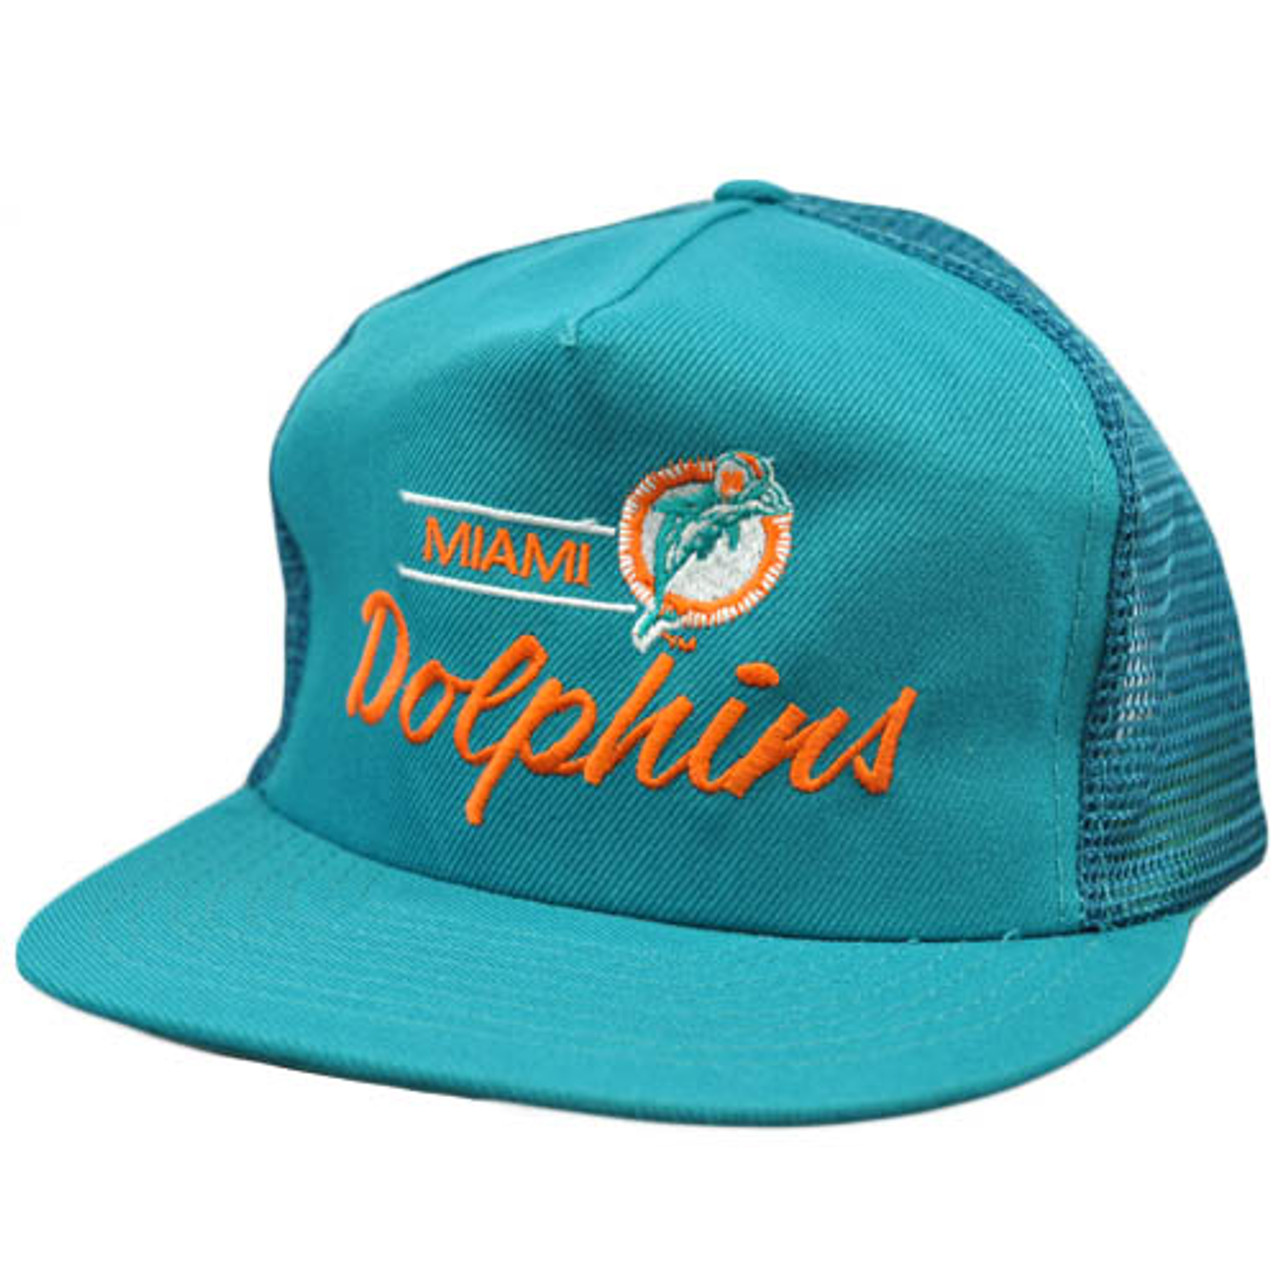 776392bc NFL Miami Dolphins Vintage Mesh Flat Bill Teal Orange Annco Snapback Hat Cap